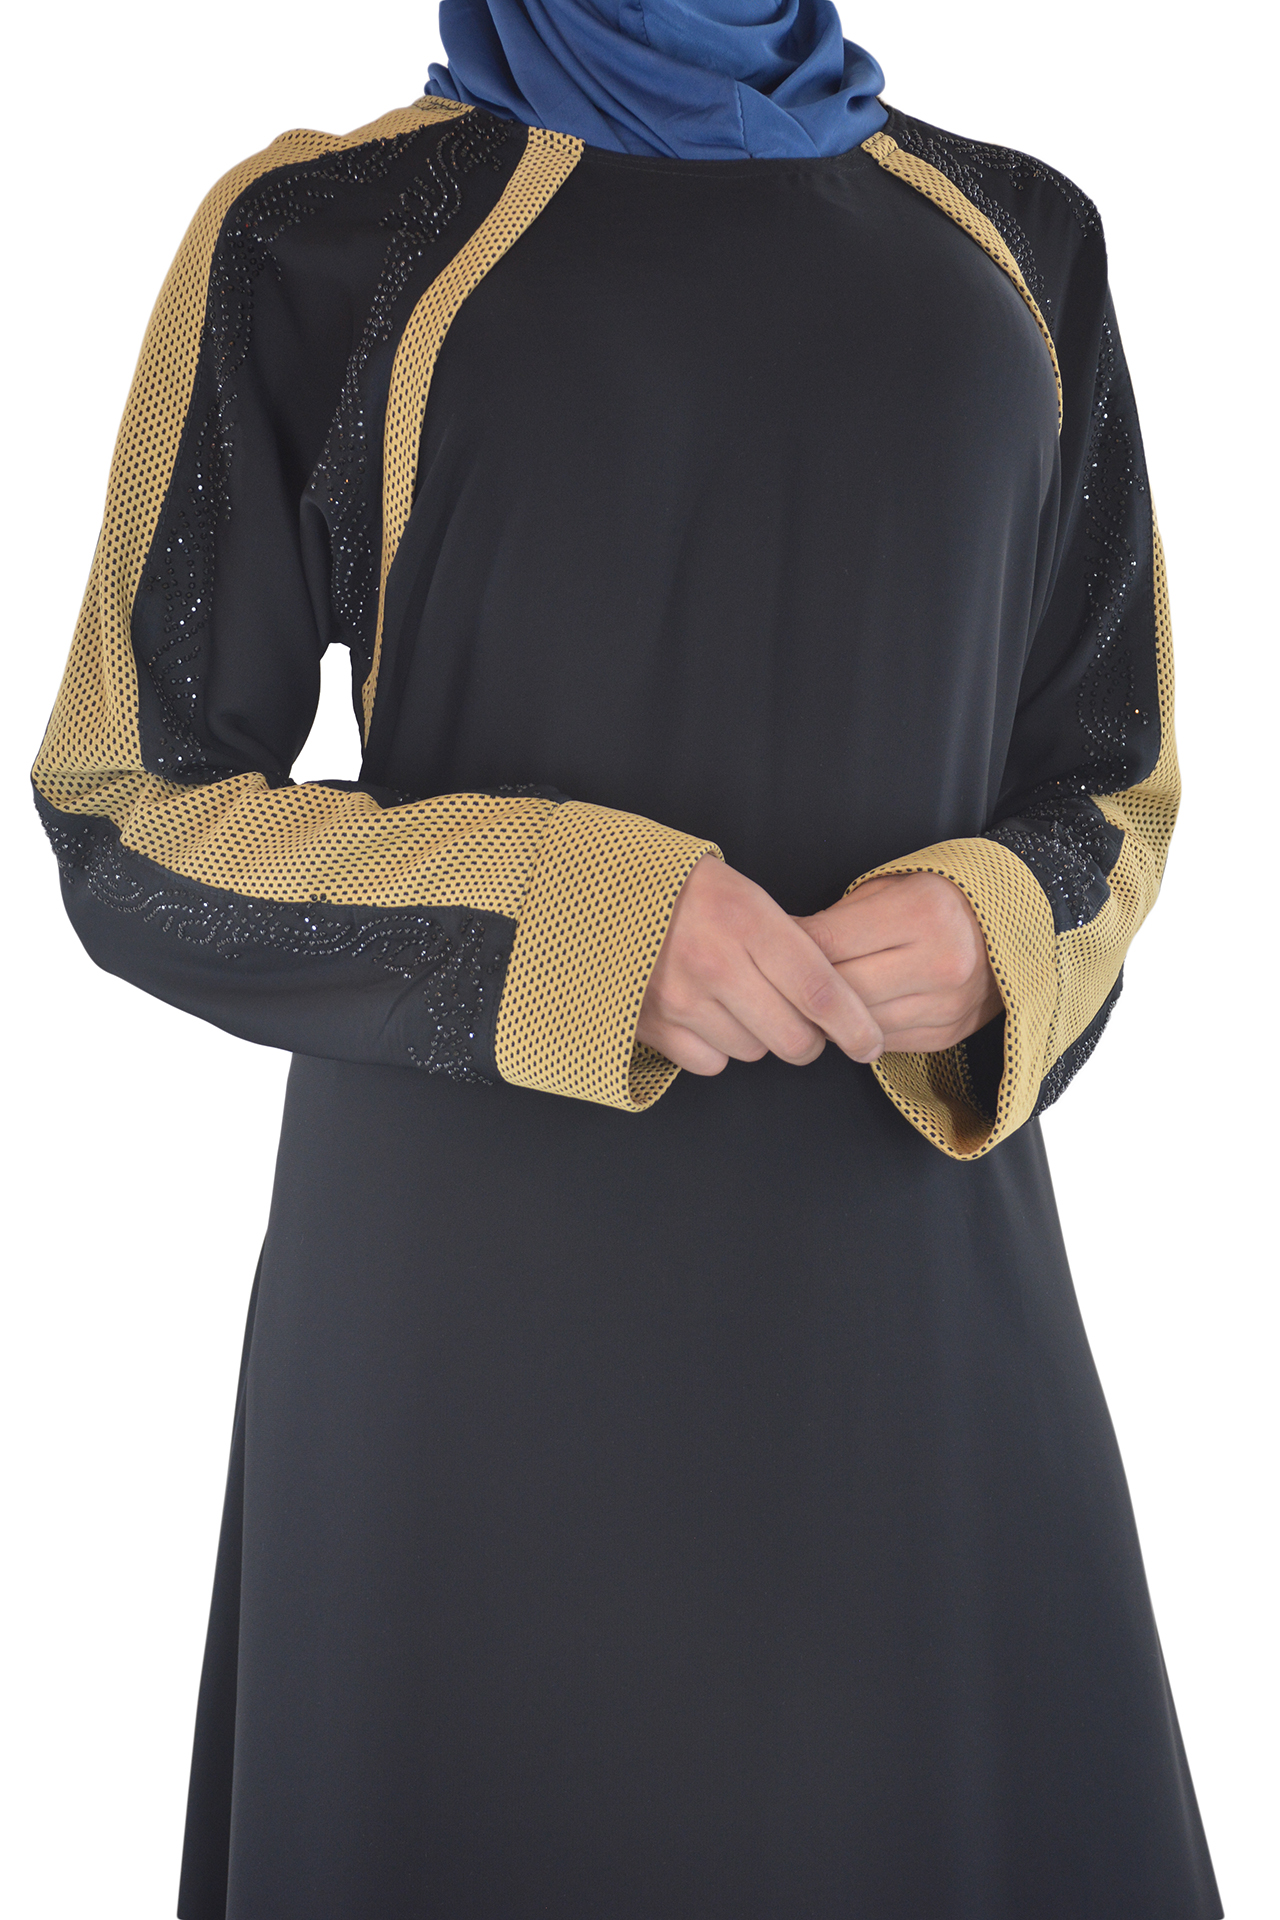 Shirin - Black and Tan Abaya Close up 2